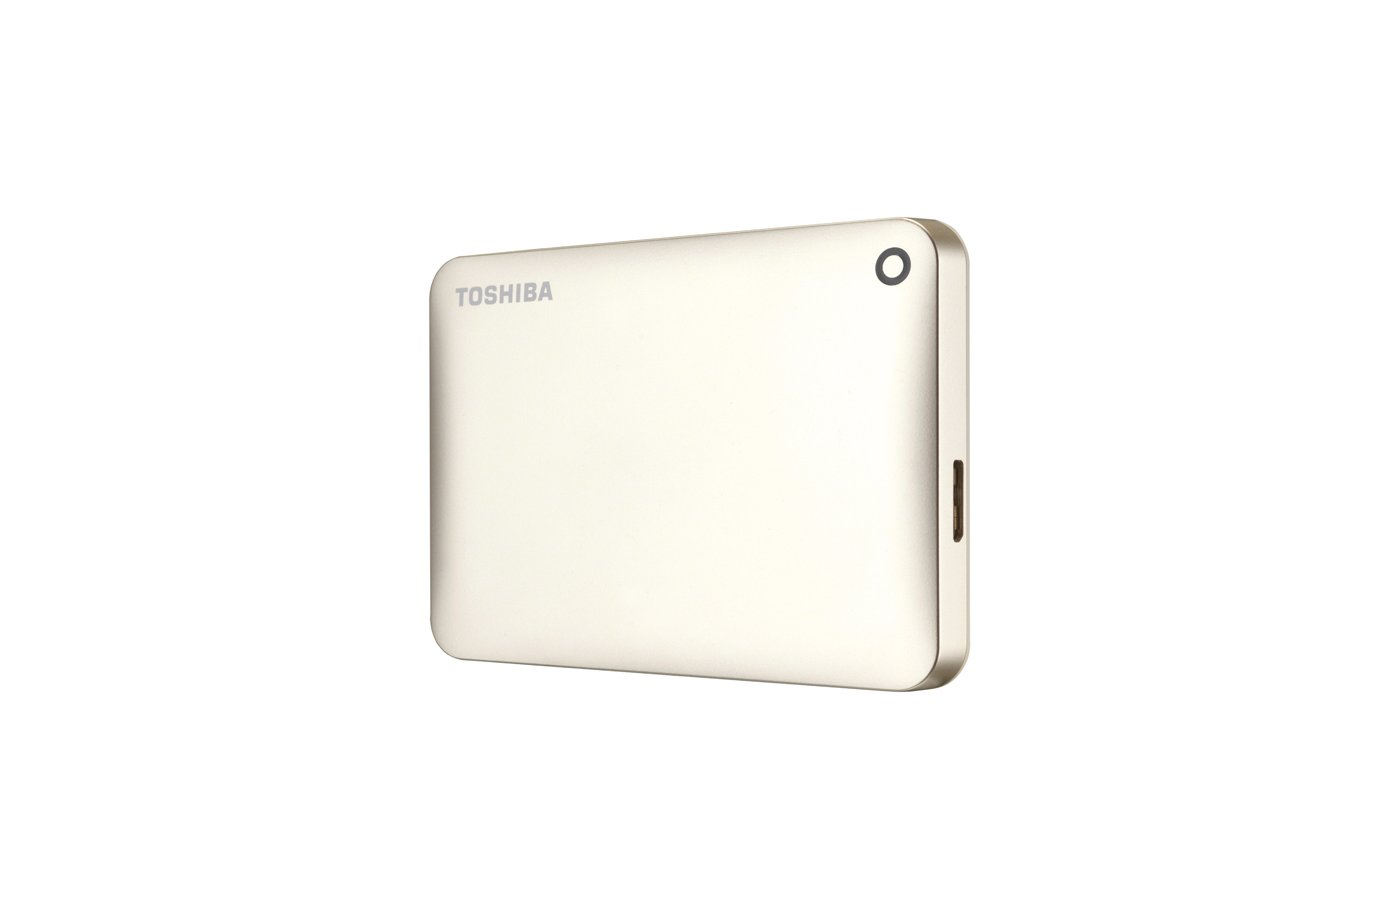 Внешний жесткий диск Toshiba HDTC805EC3AA 500Gb USB 3.0 CANVIO Connect II 2.5 золотистый